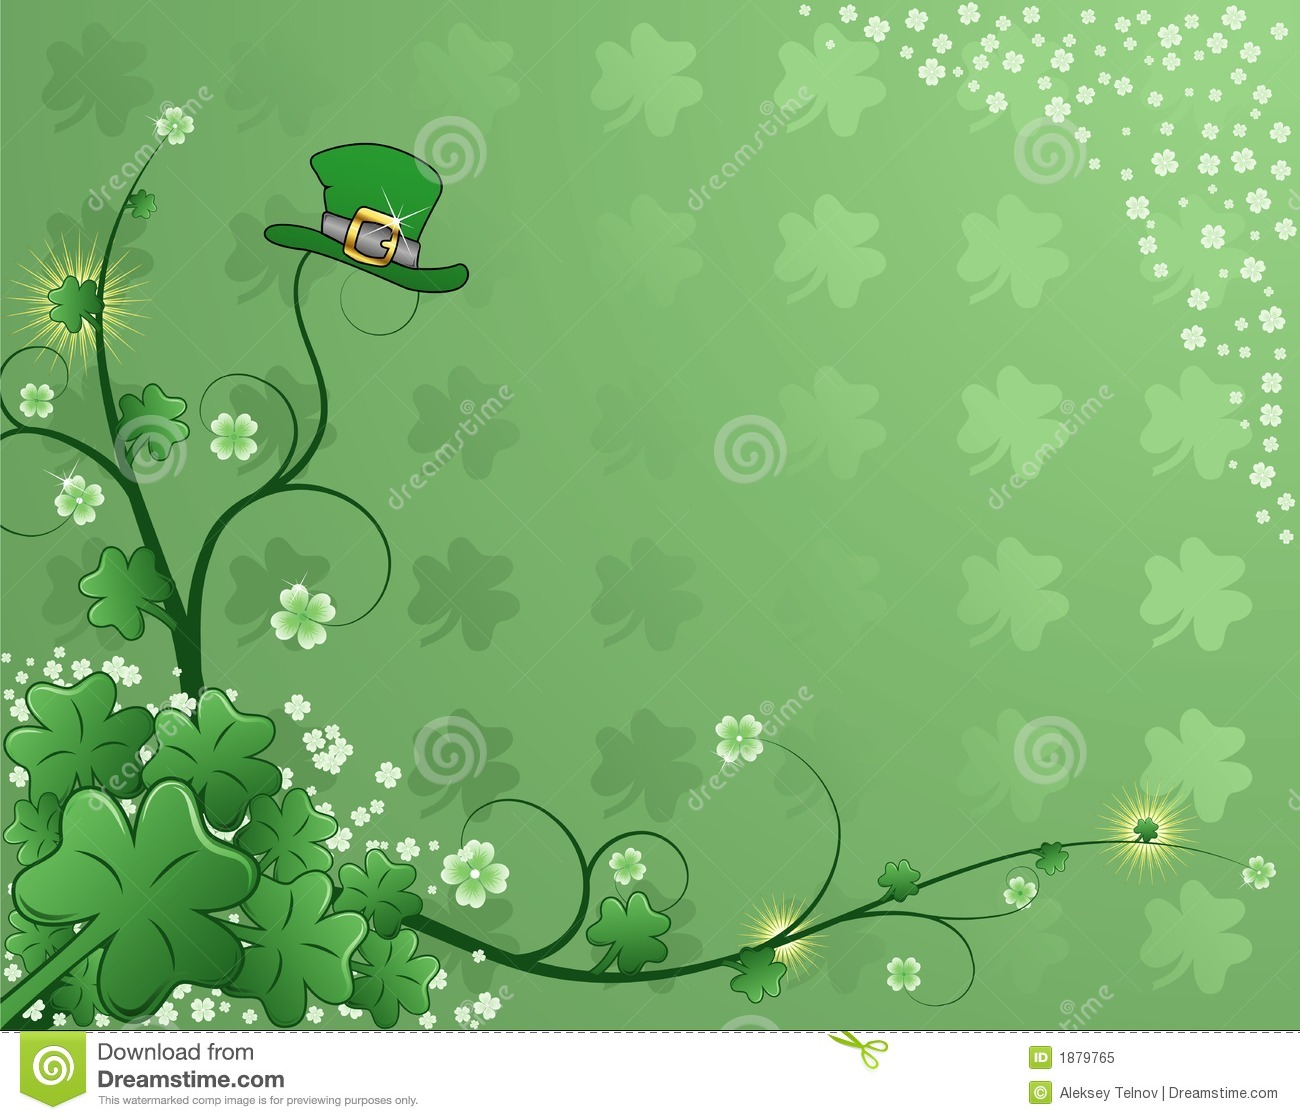 Free Download St Patricks Day Wallpaper Hd Irish Desktop Wallpaper